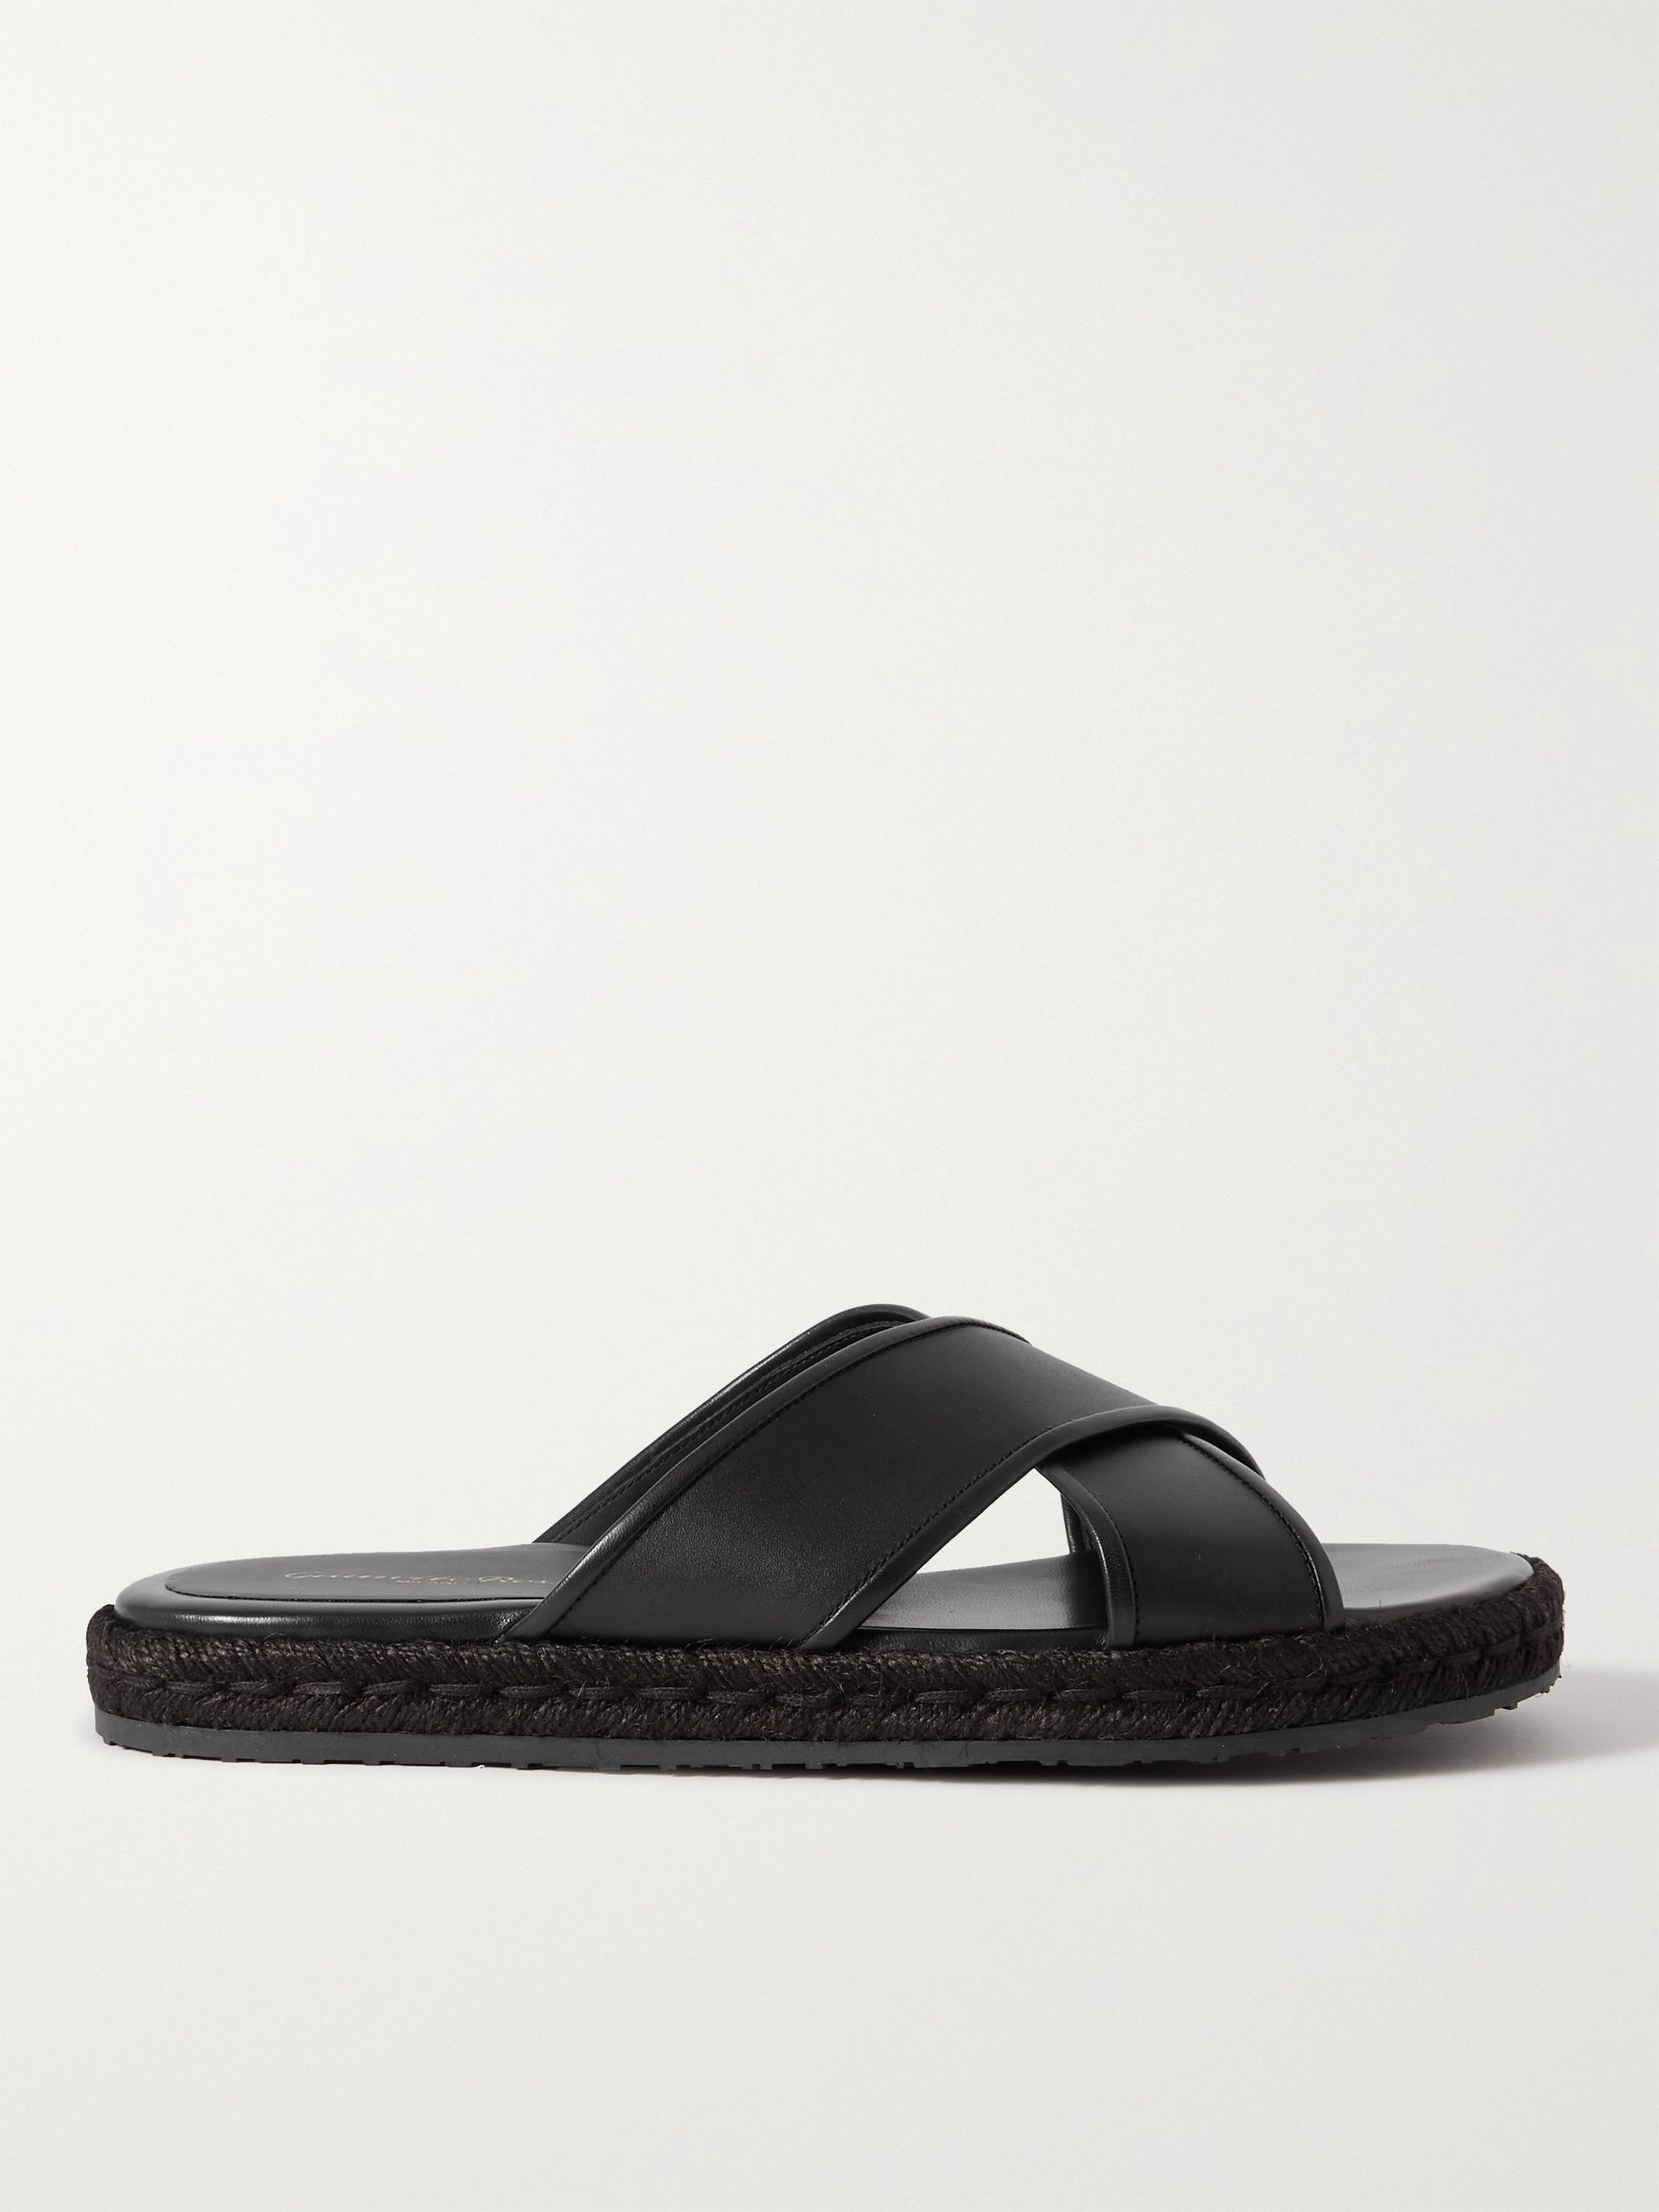 GIANVITO ROSSI Leather Espadrille Slides,Black